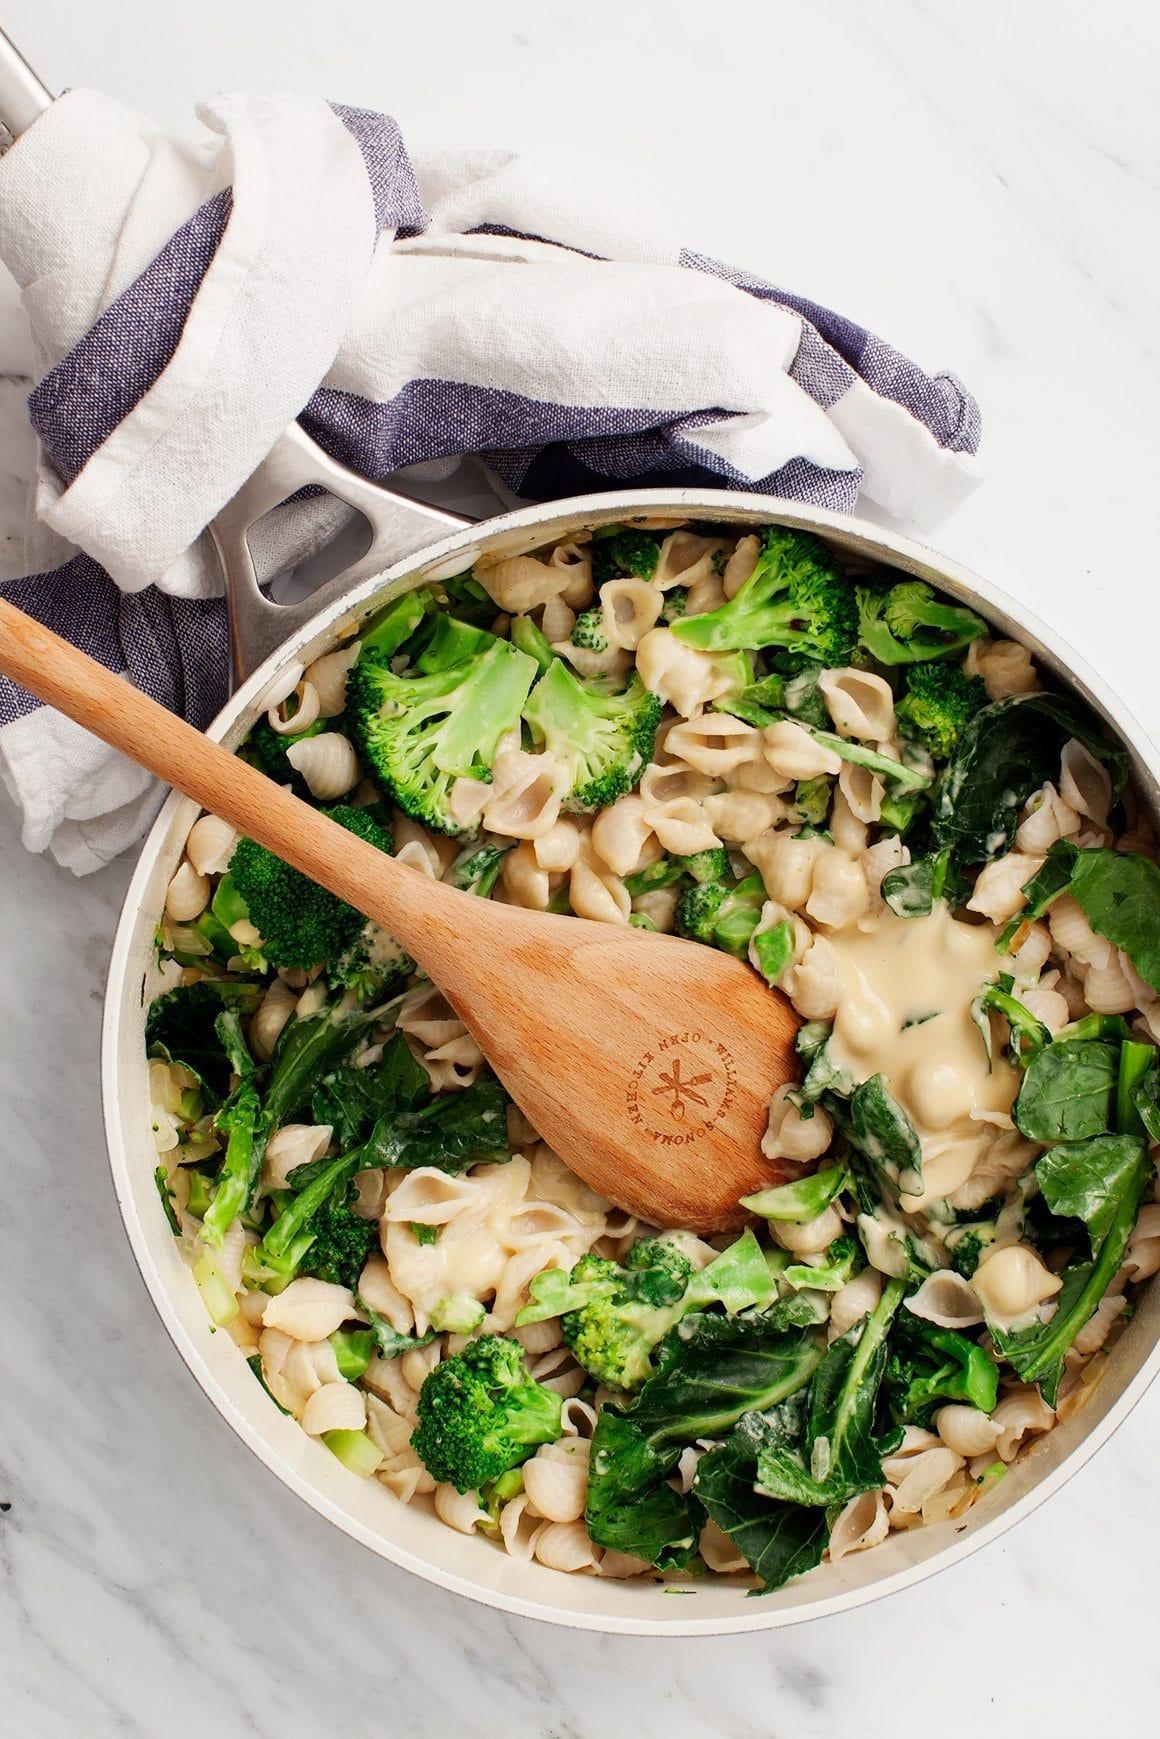 Healthy Vegetarian Food Recipes  Healthy Ve arian Dinner Recipes Love and Lemons